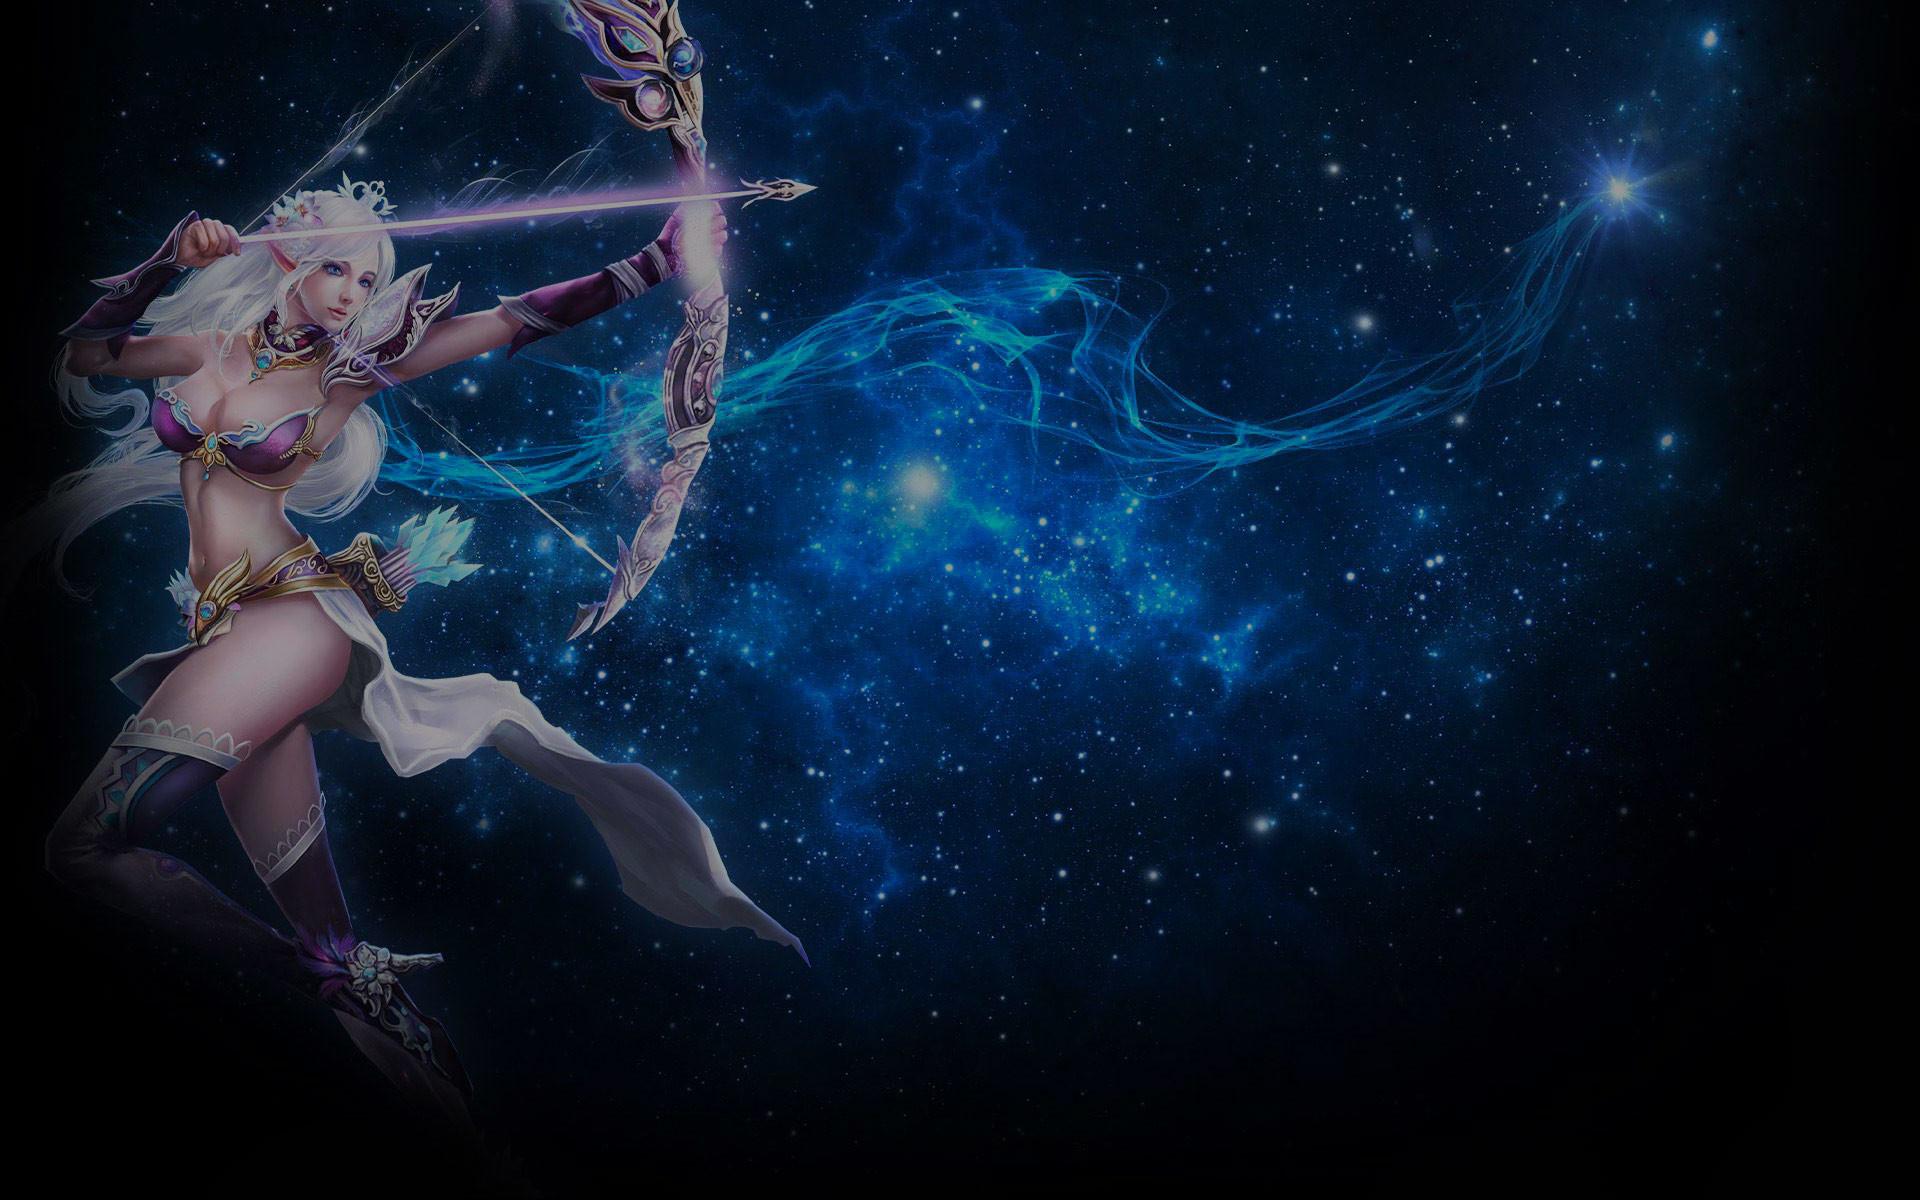 Sagittarius Wallpaper (69+ images)